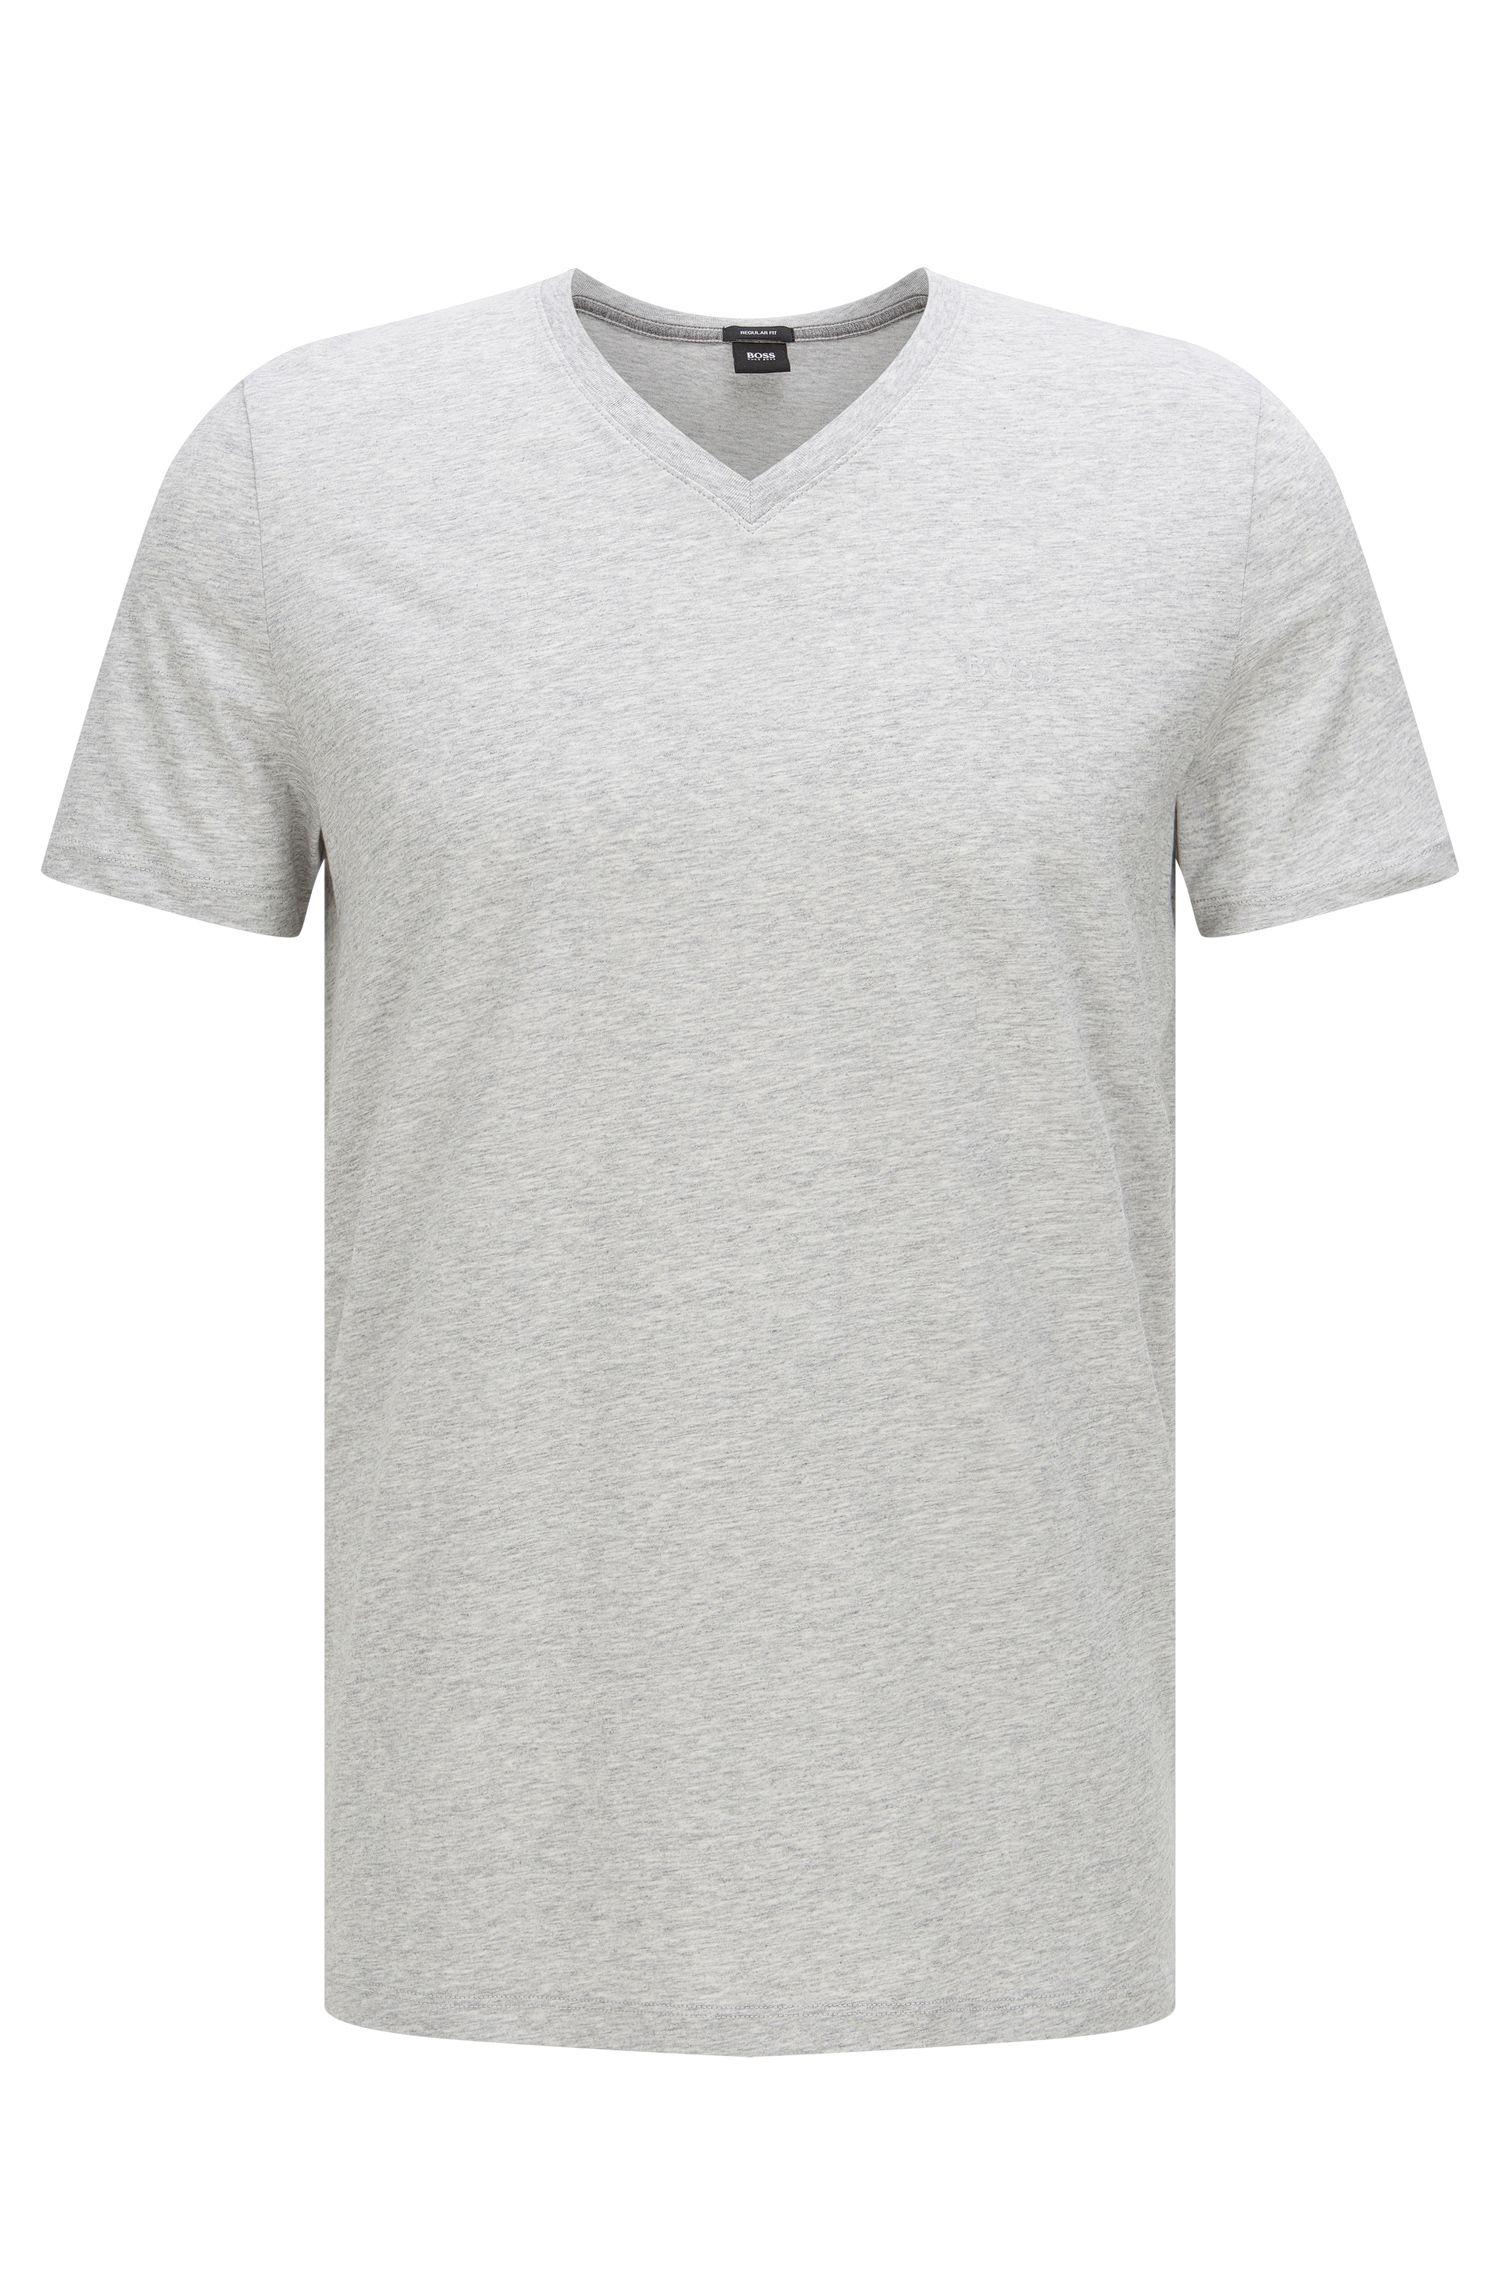 Unifarbenes Regular-Fit T-Shirt aus Baumwolle: 'Tilson 11'